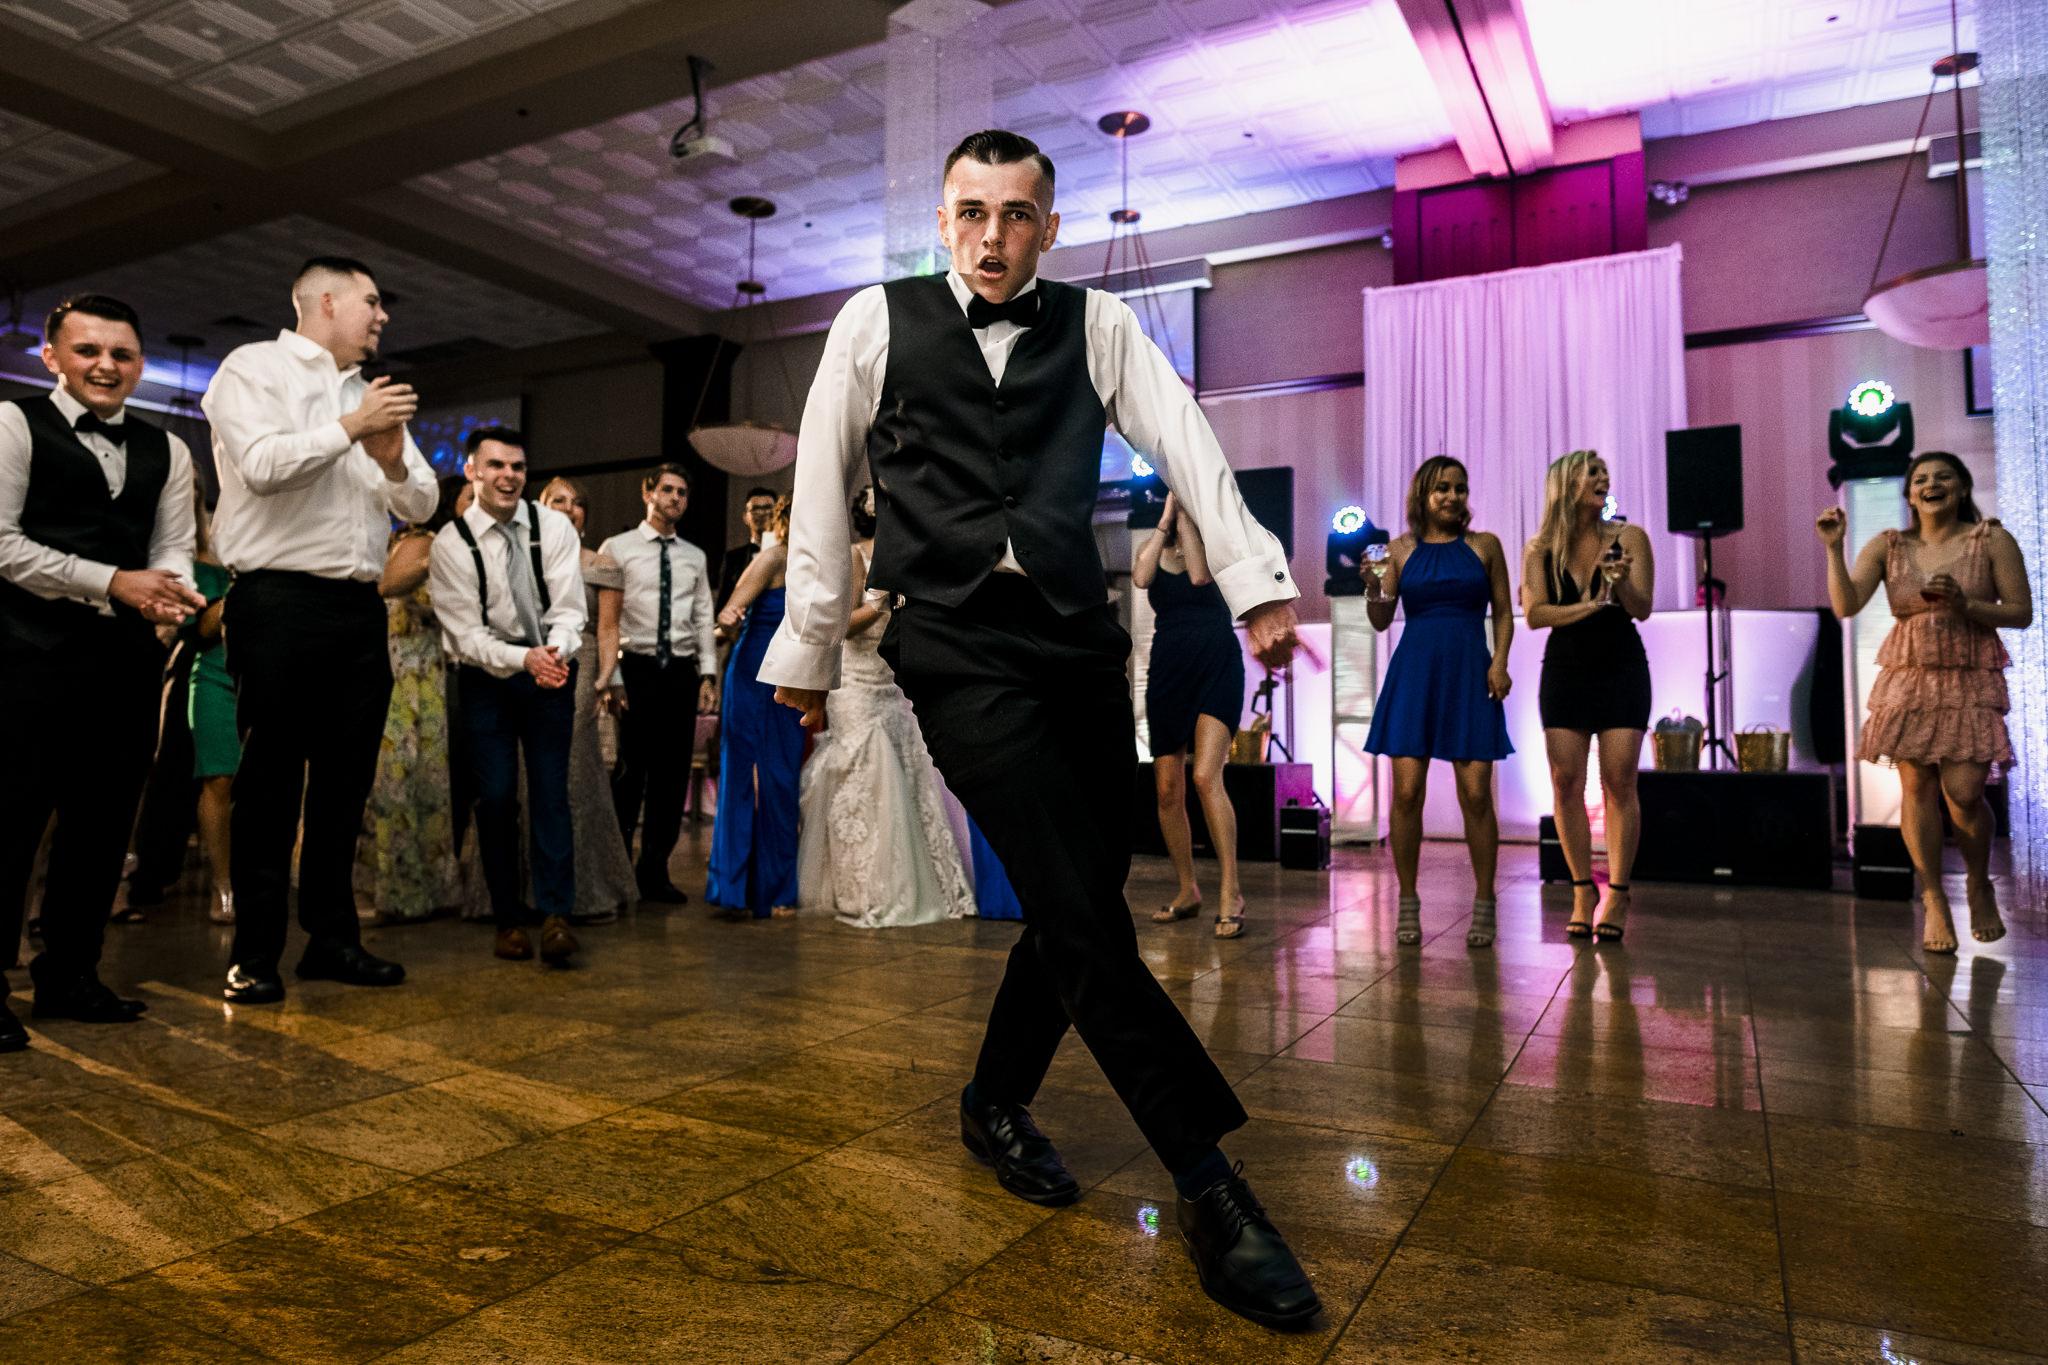 Brennan-South-Gate-Manor-New-Jersey-Wedding-Photographer-39.JPG